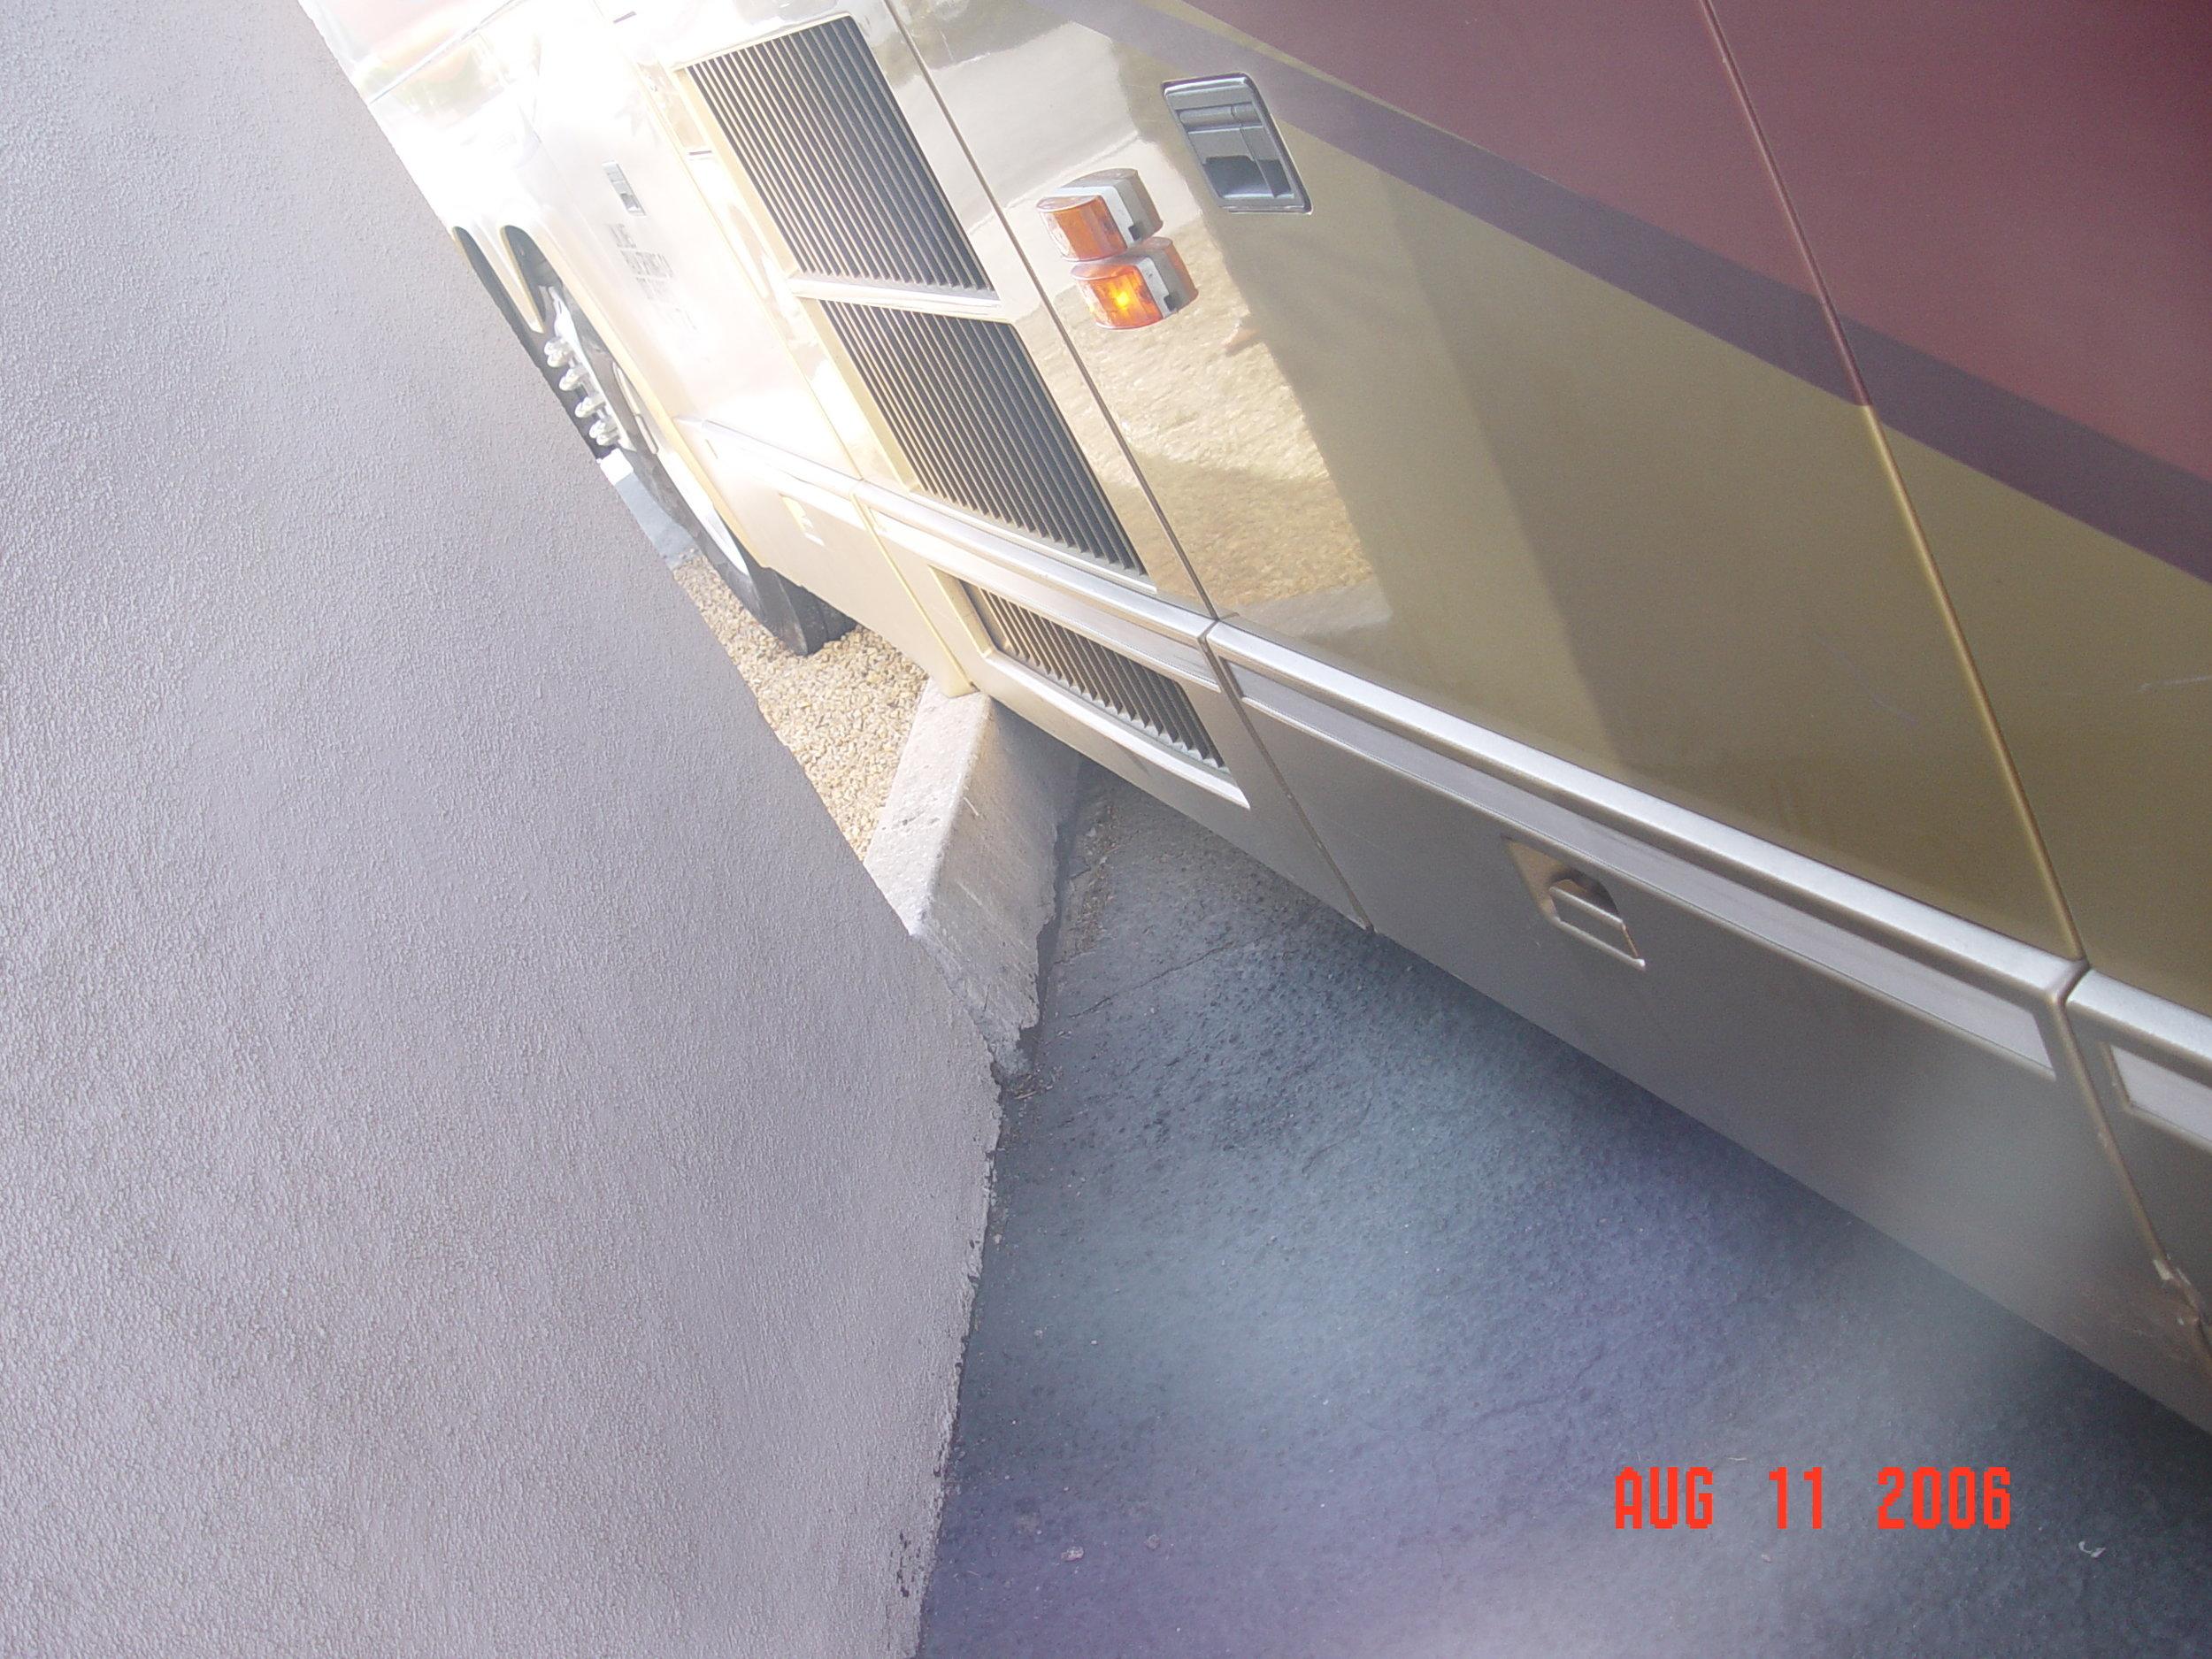 DSC04498.JPG